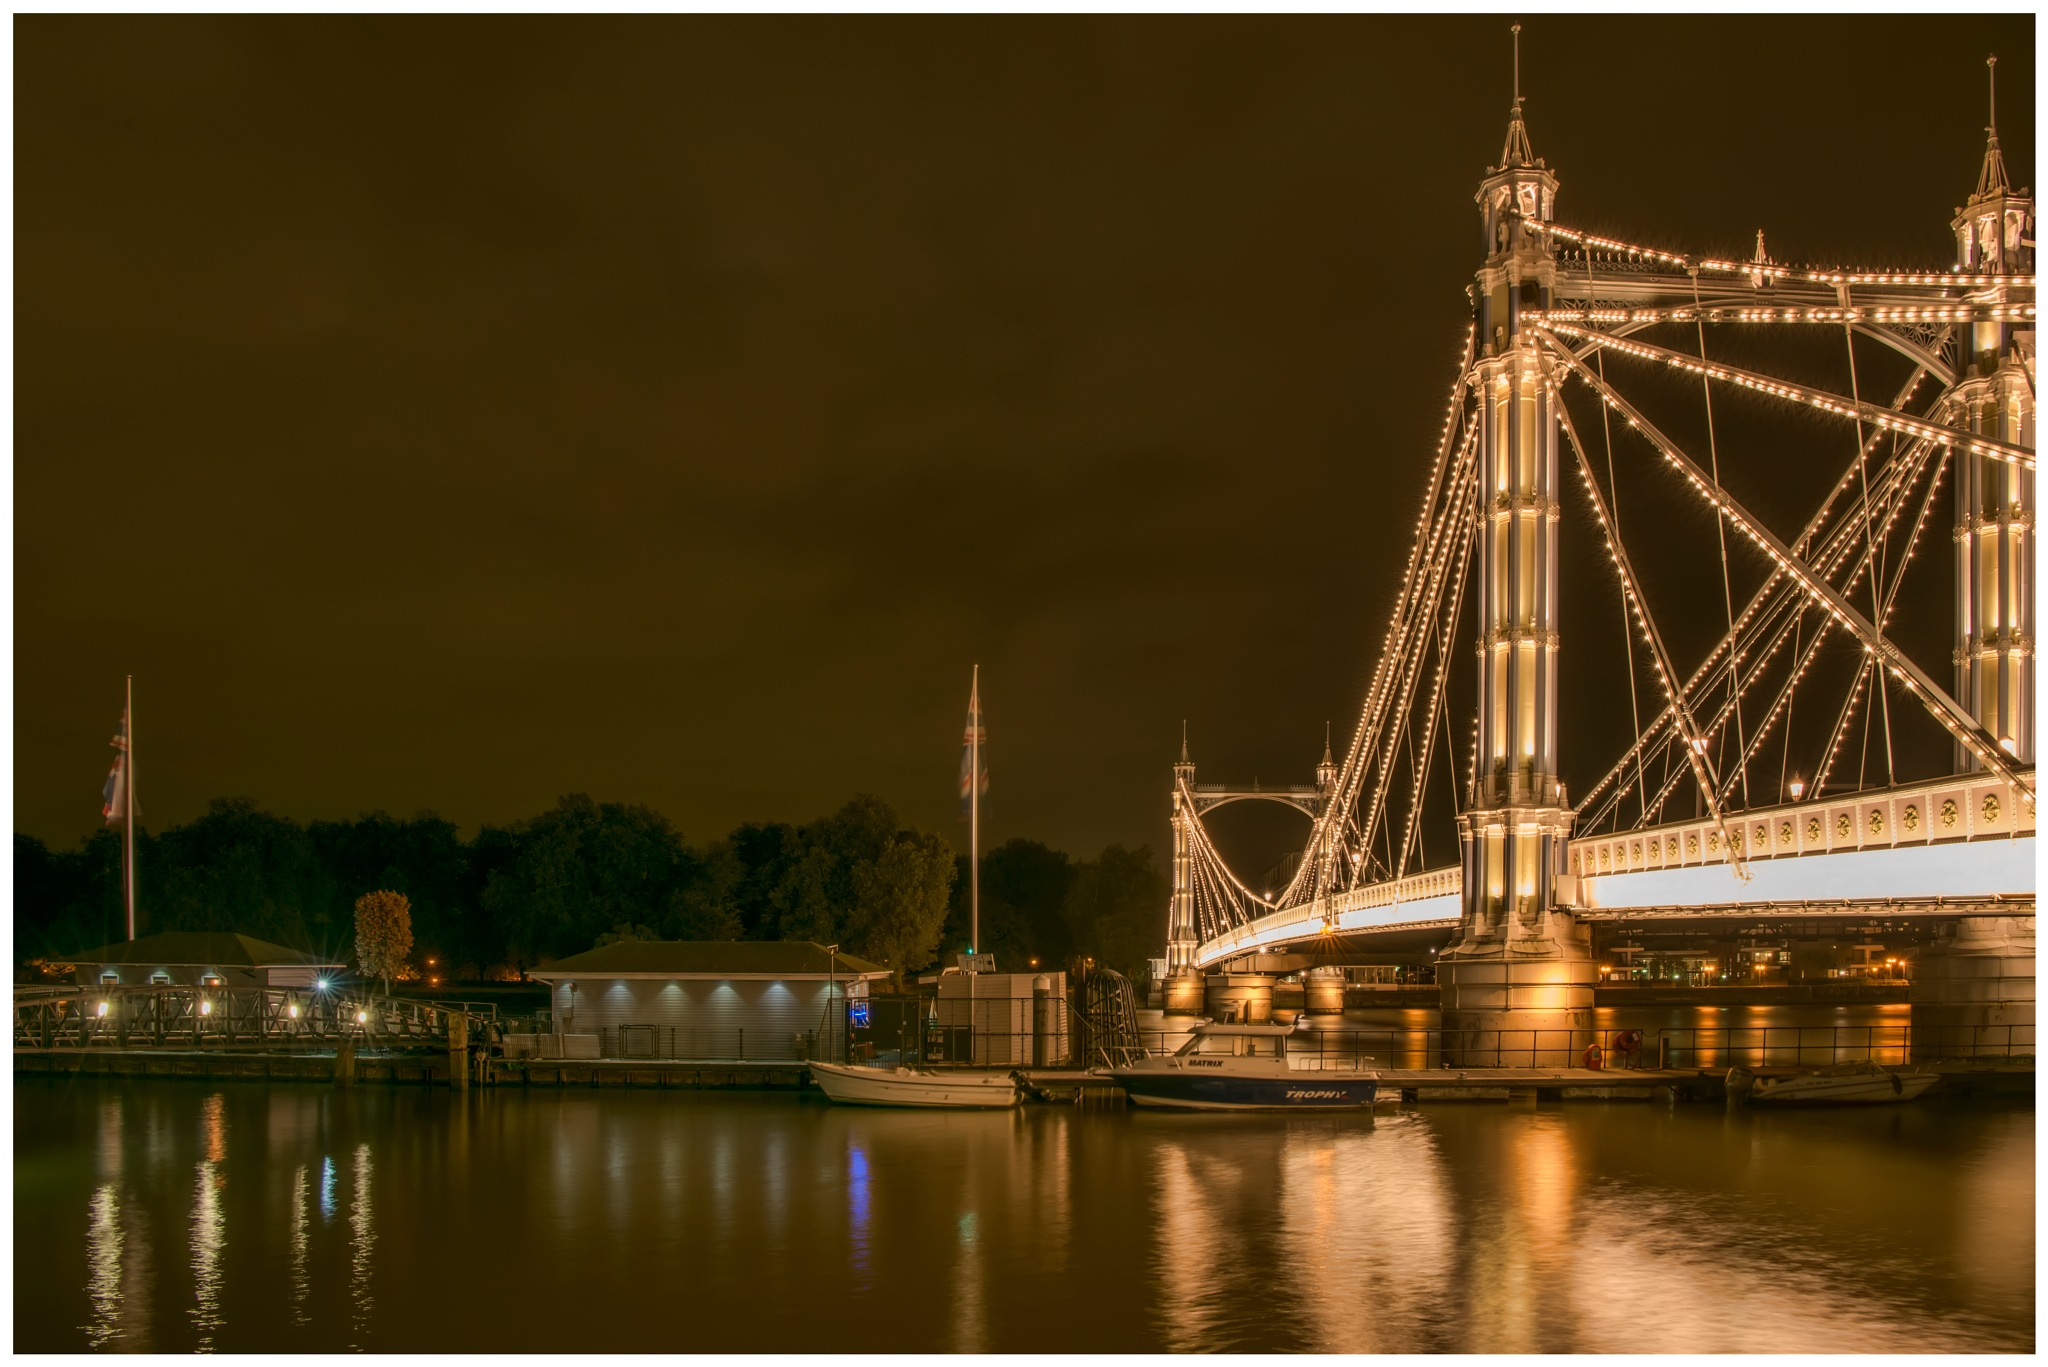 Albert Bridge by Colin Ritchie